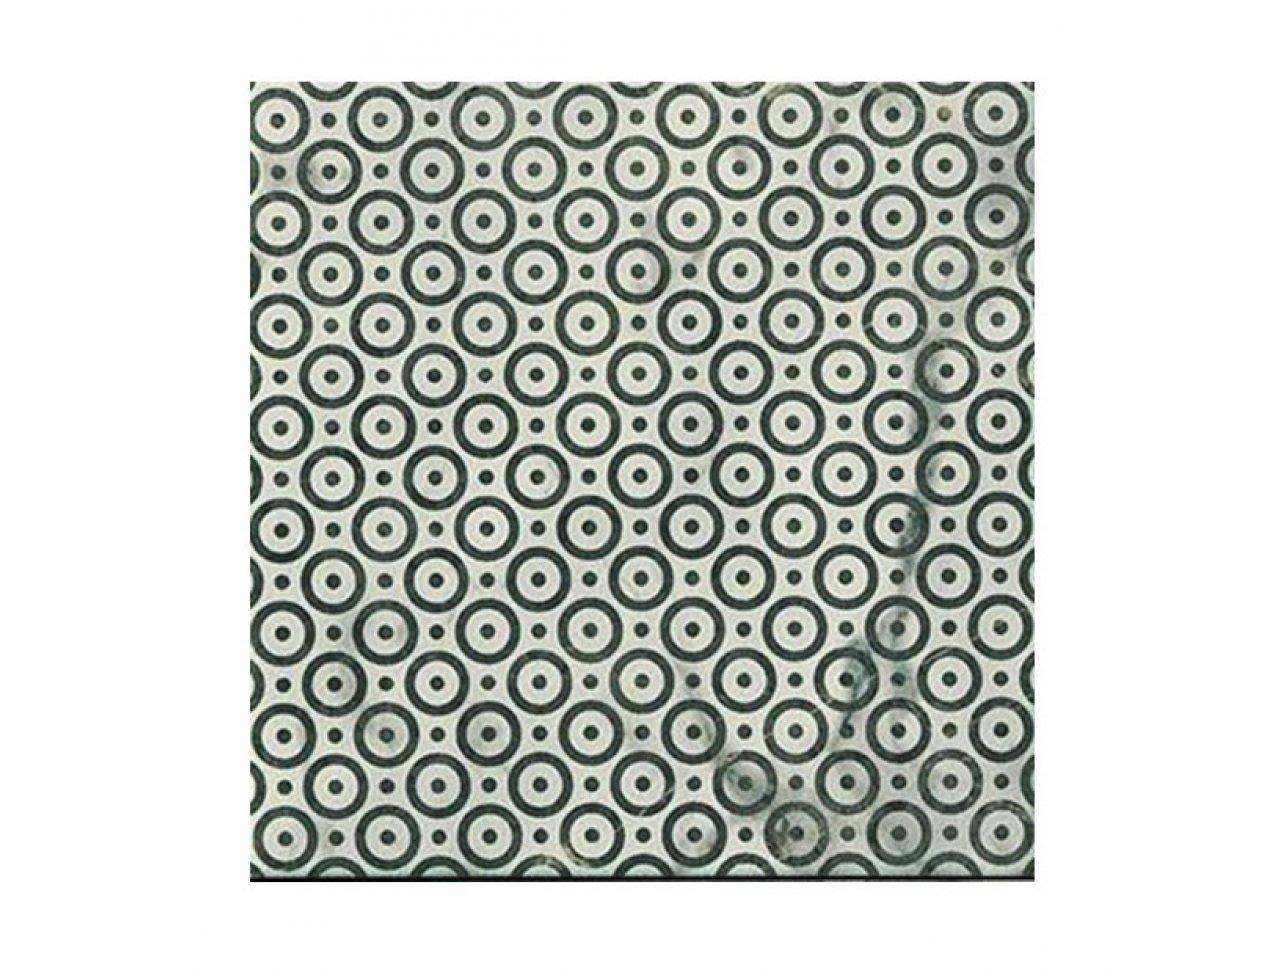 Настенный декор FAP Roma Deco 20 Calacatta Imperiale MIX 20 x 20 см, Арт. fLX1